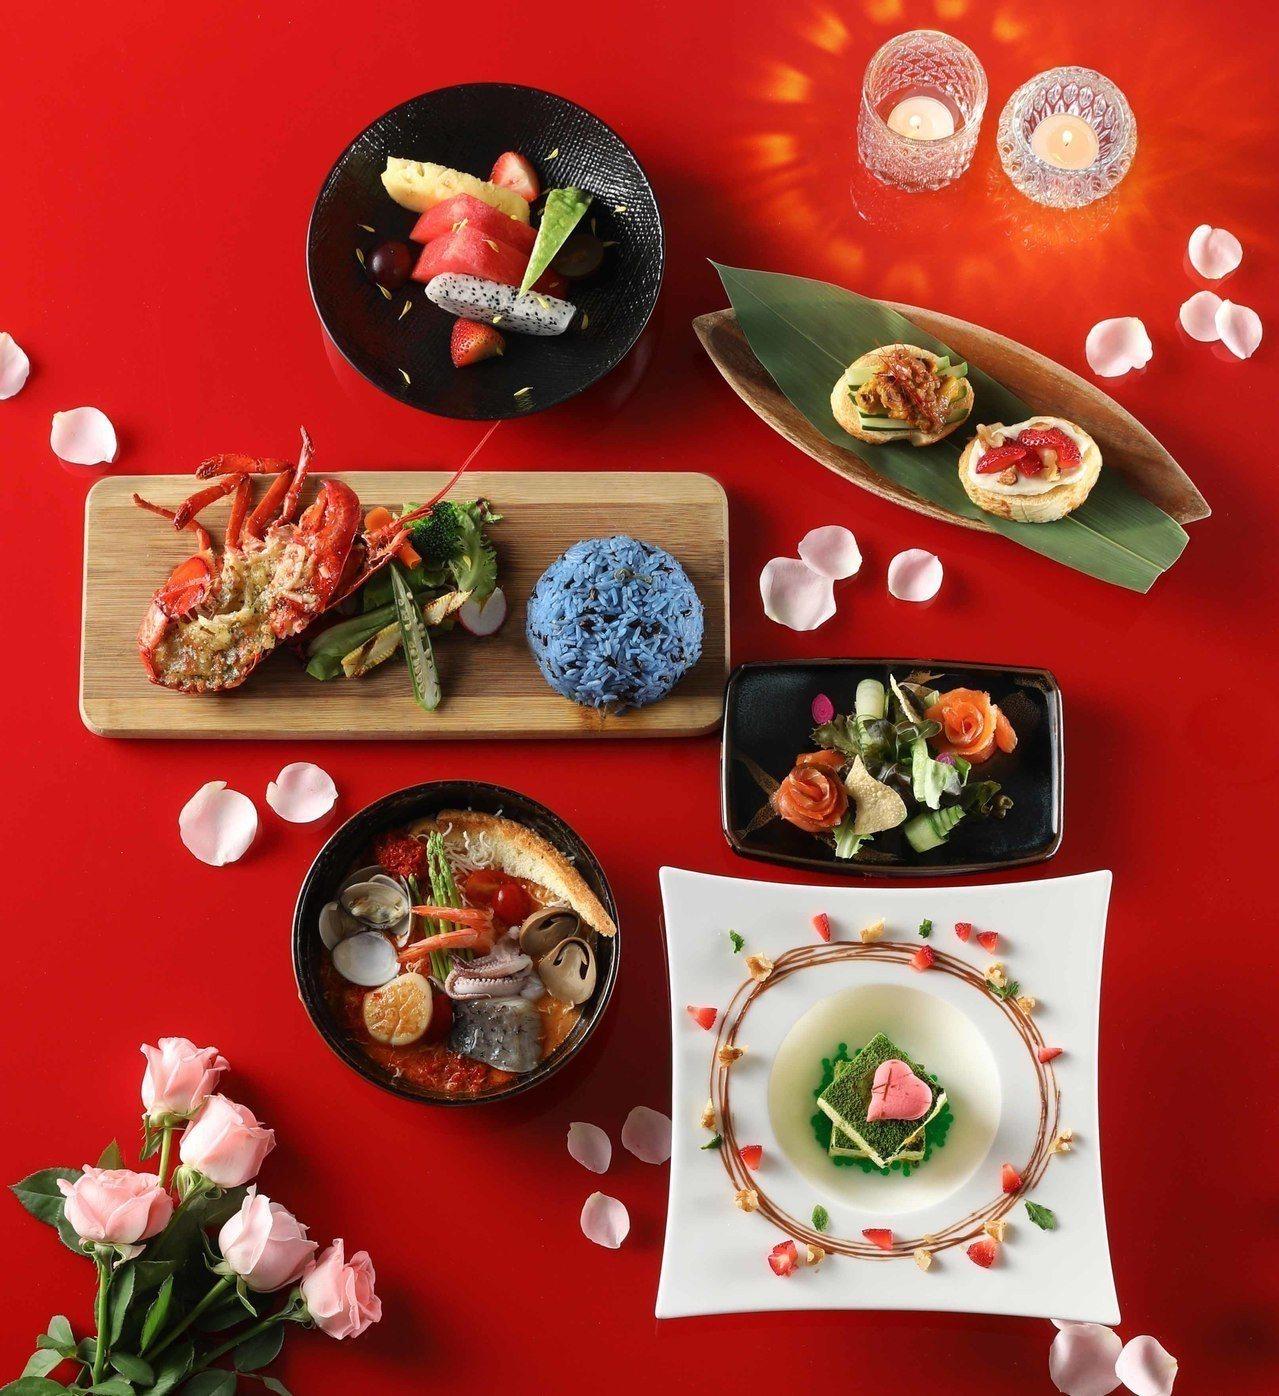 「Asia 49亞洲料理及酒廊」將自8月17日至19日以精心設計的「醉愛冰沙雞尾...